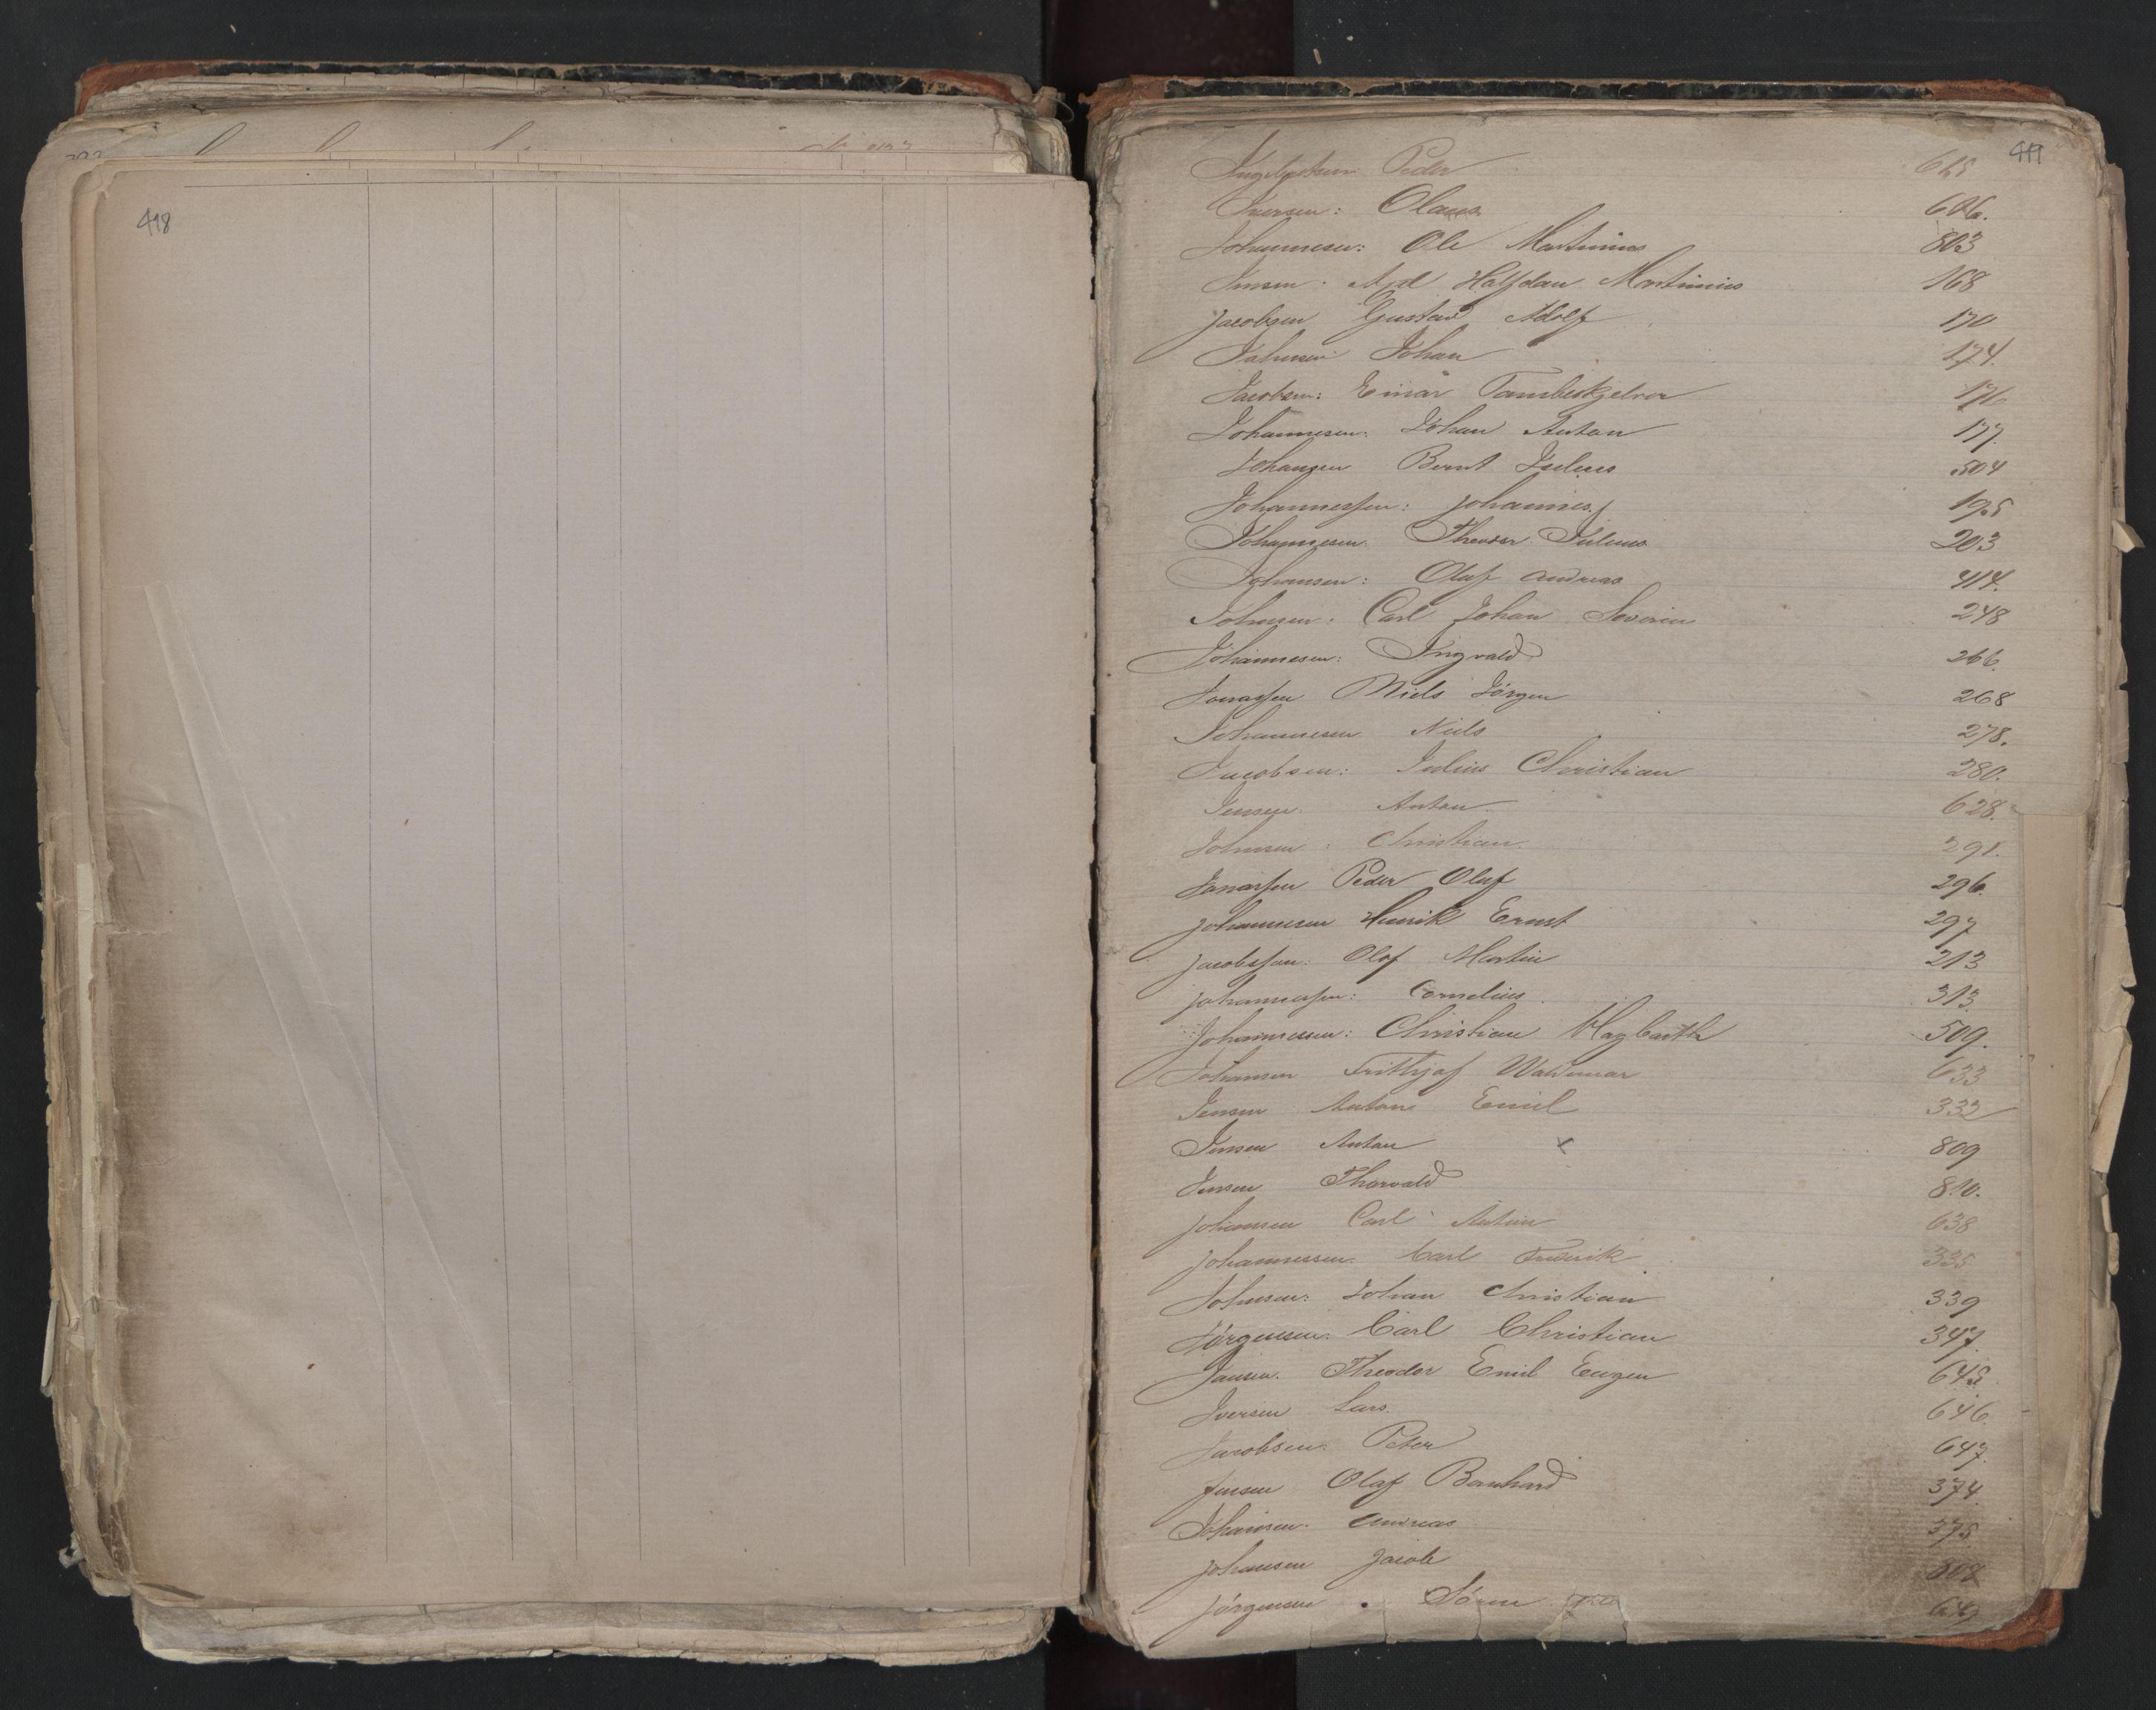 SAO, Oslo sjømannskontor, F/Fa/L0001: Register for Kristiania krets, 1866-1891, s. 418-419